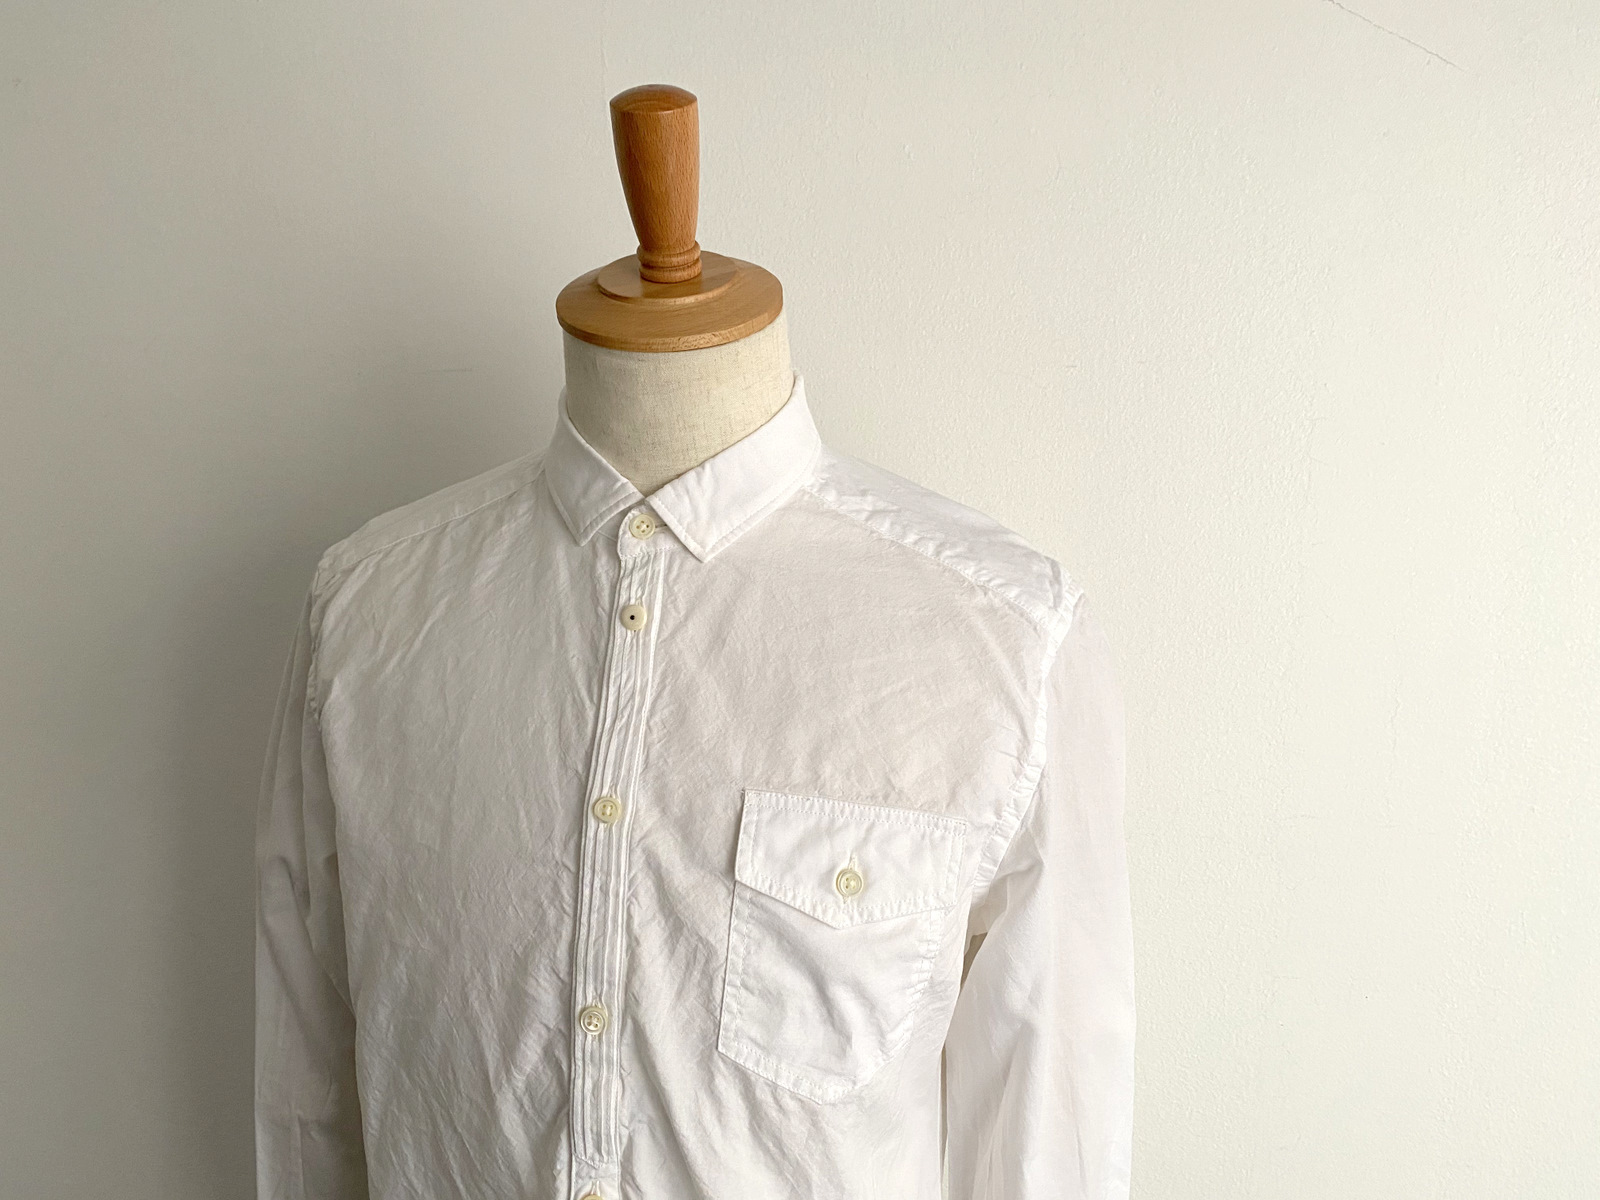 Compact Ox Round Hem Shirt_c0379477_13201571.jpg